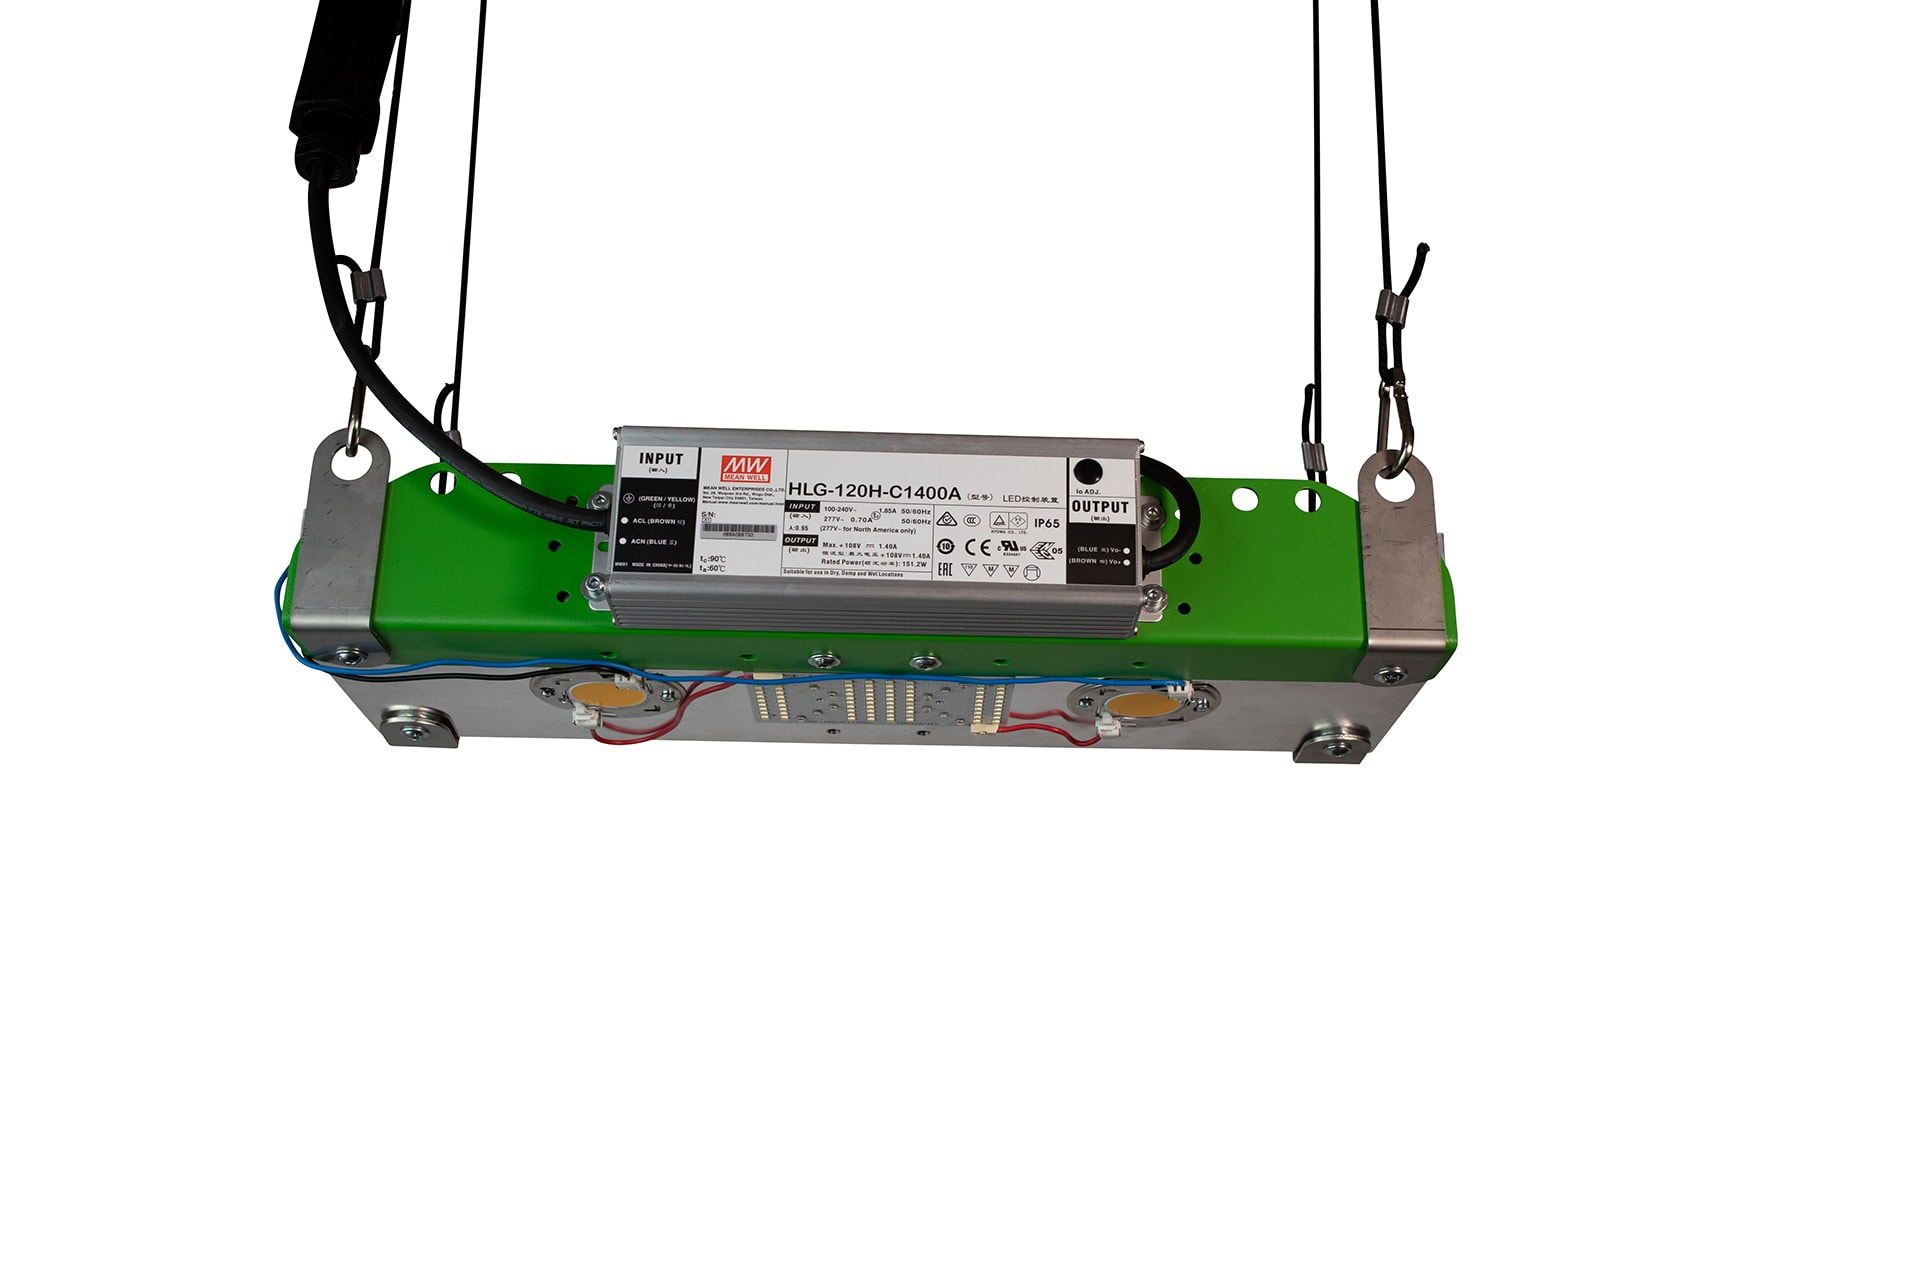 DIY-M-KIT-Cob-SMD-150w-front-up-driver-chips-board-pro-emit-hd